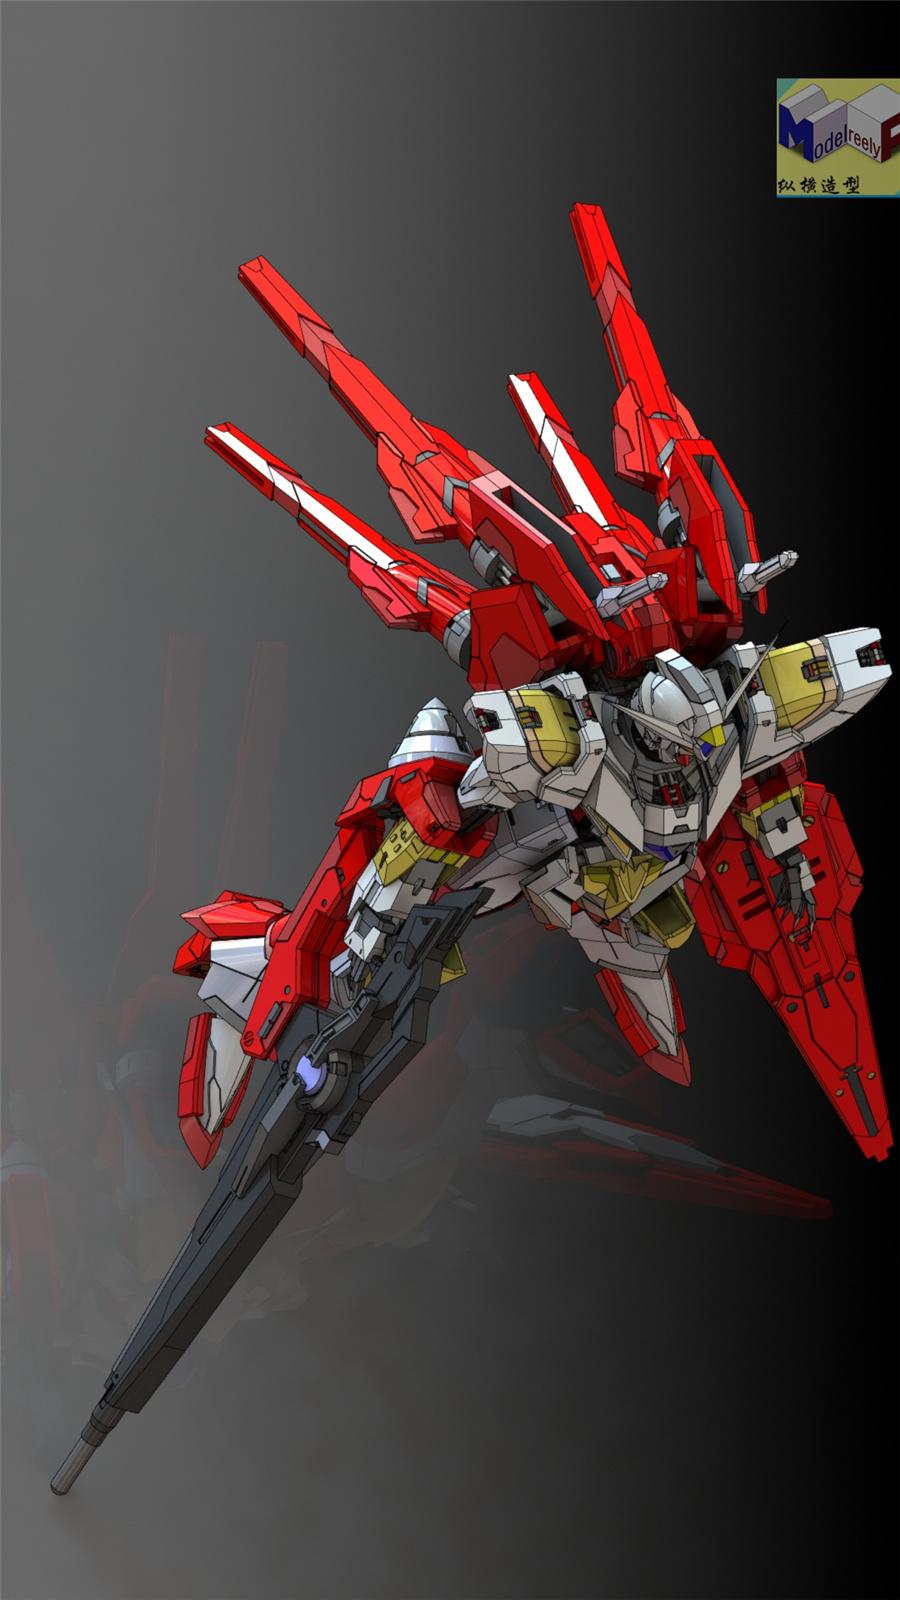 G152_Ribonzu_mg_info_inask_041.jpg